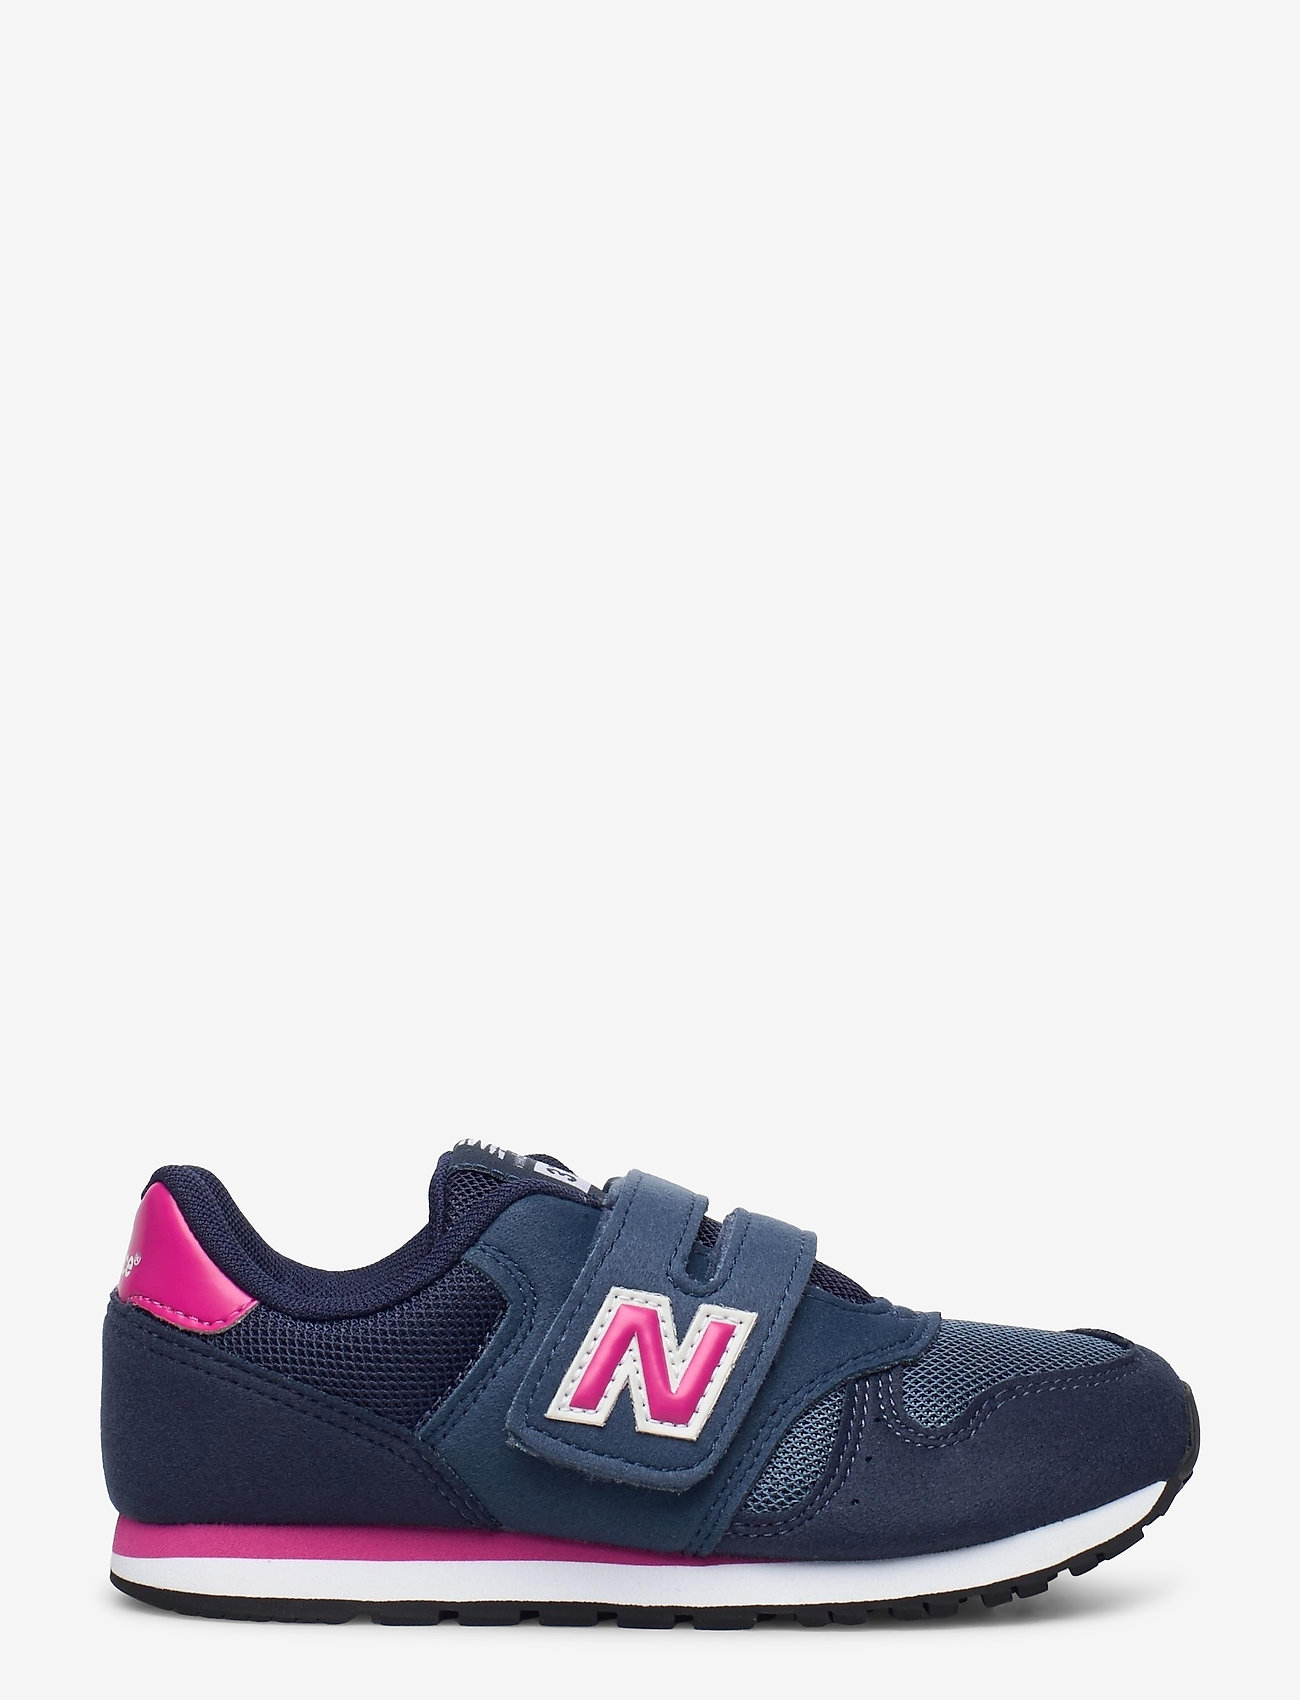 New Balance - YV373AB - baskets basses - navy/pink - 1